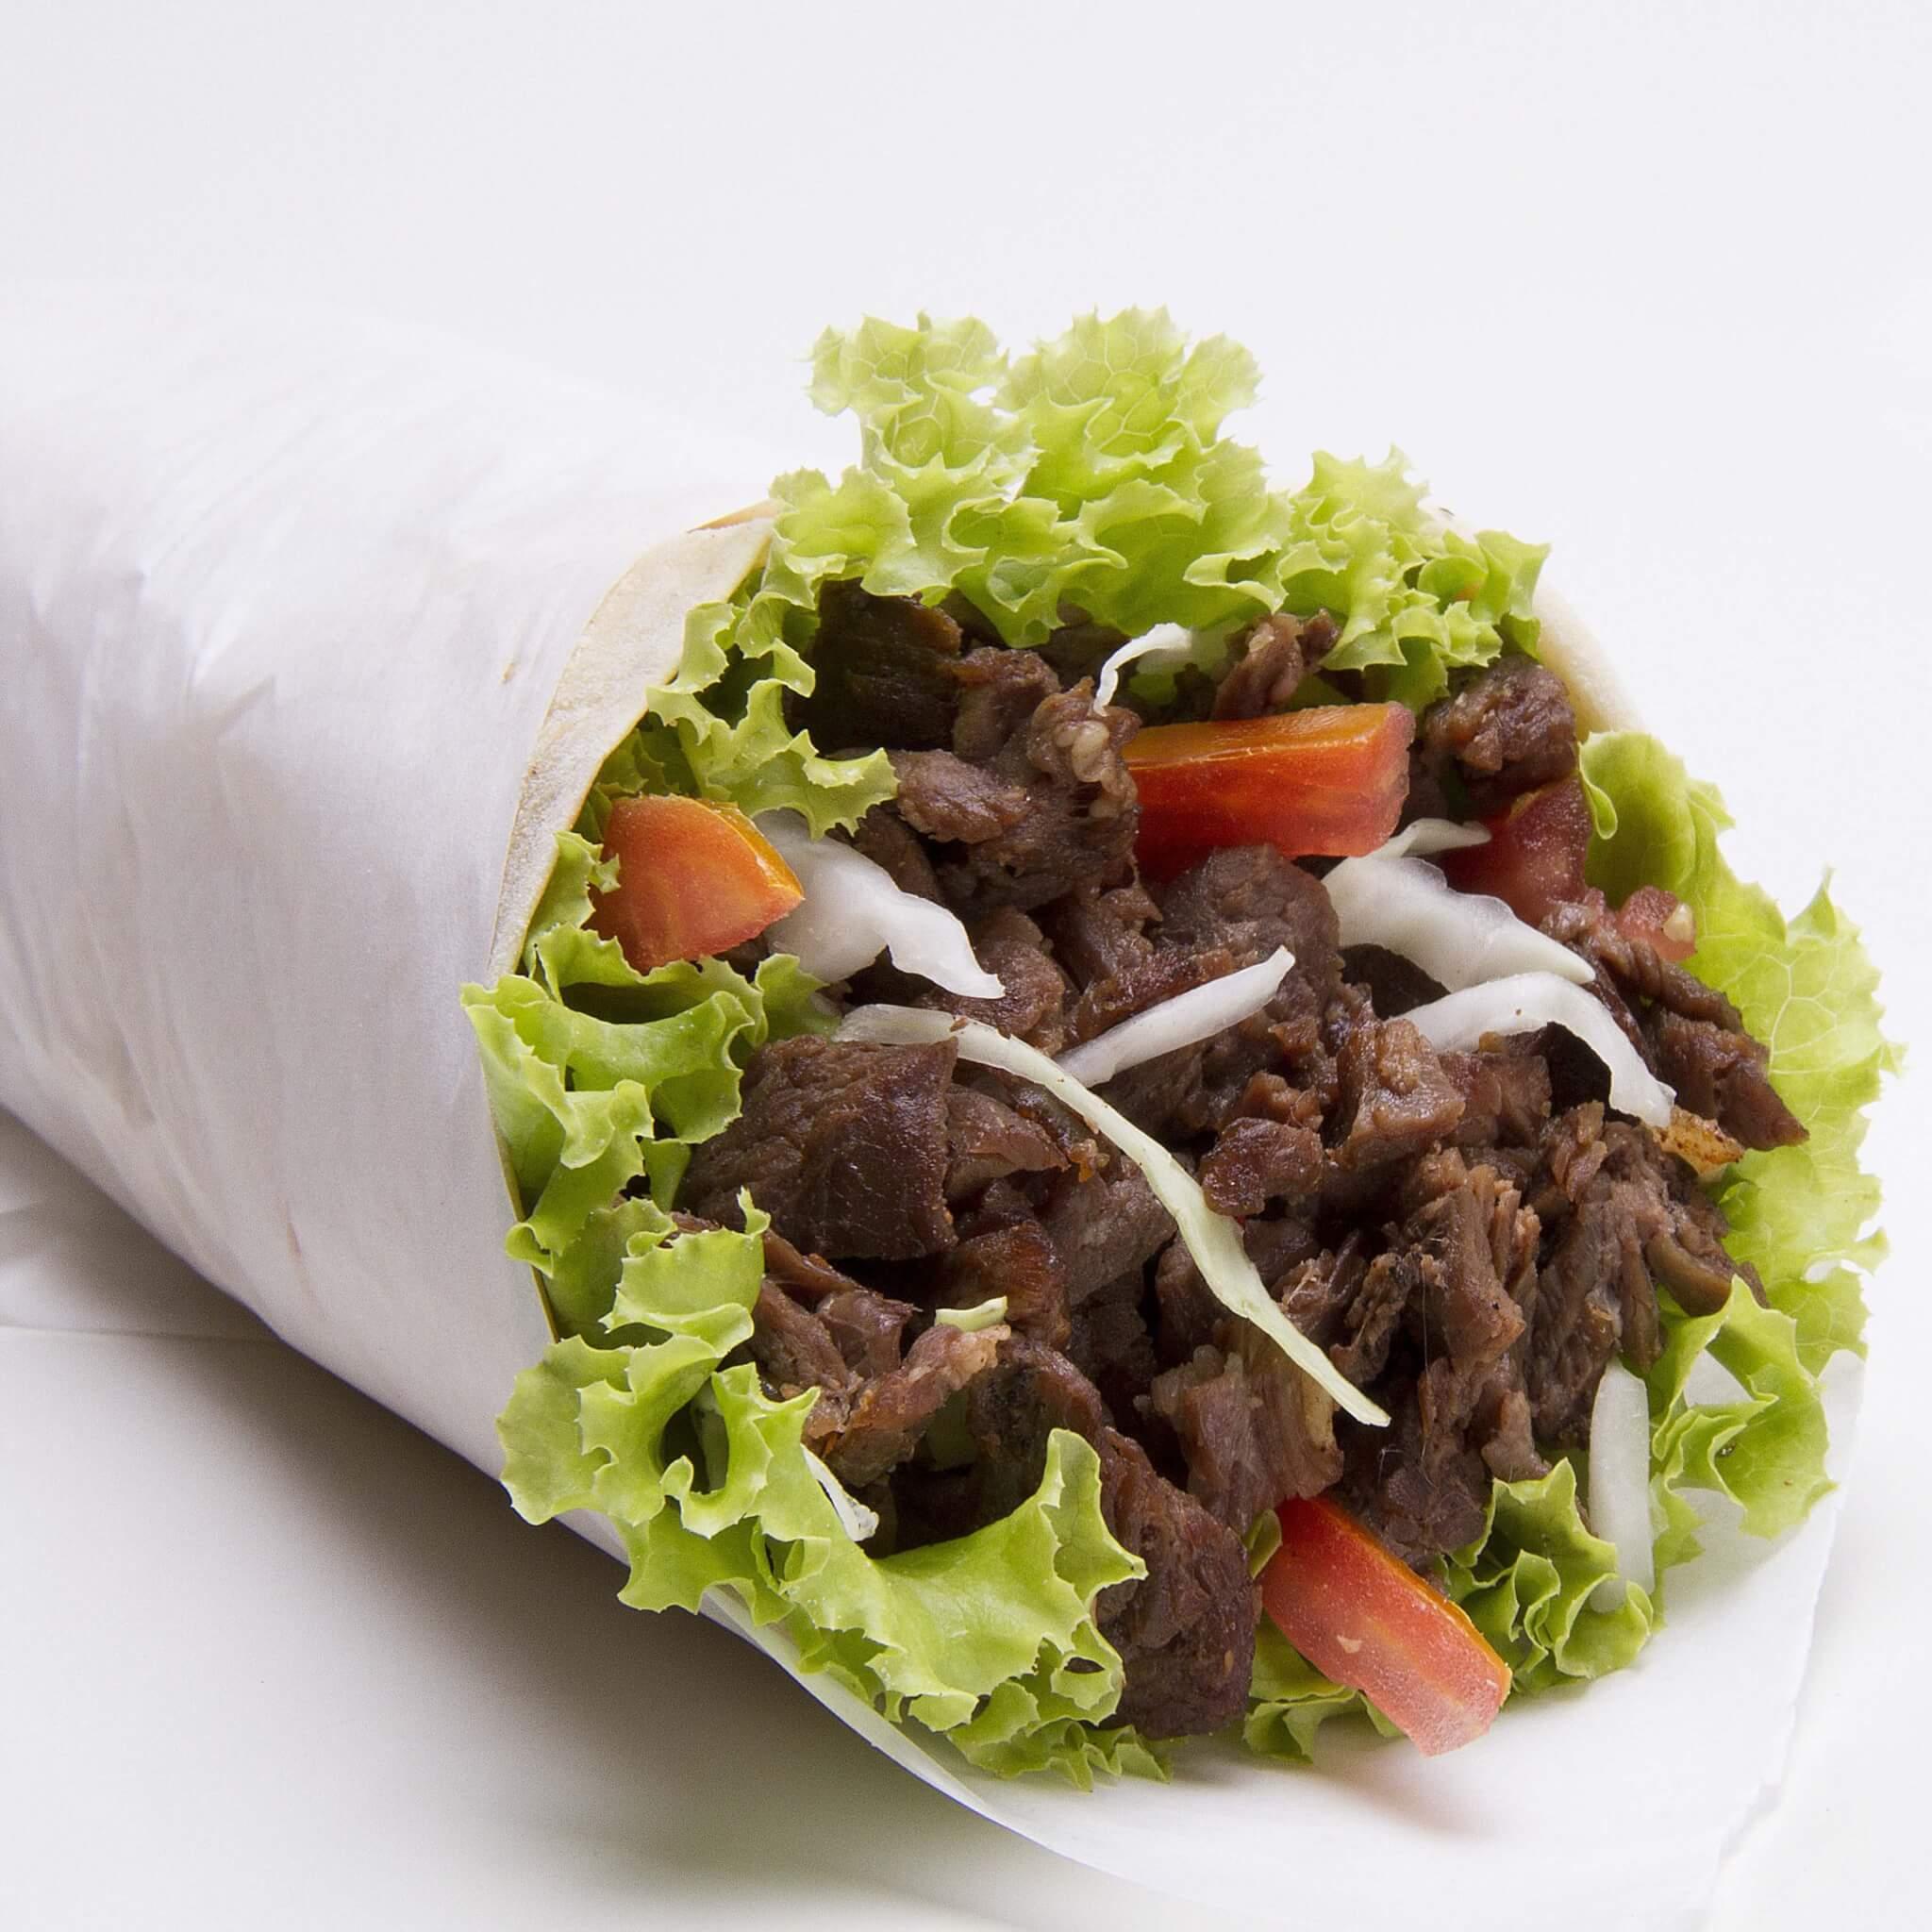 Greek Spiced Ground Meat Medley with Yogurt or Sour Cream